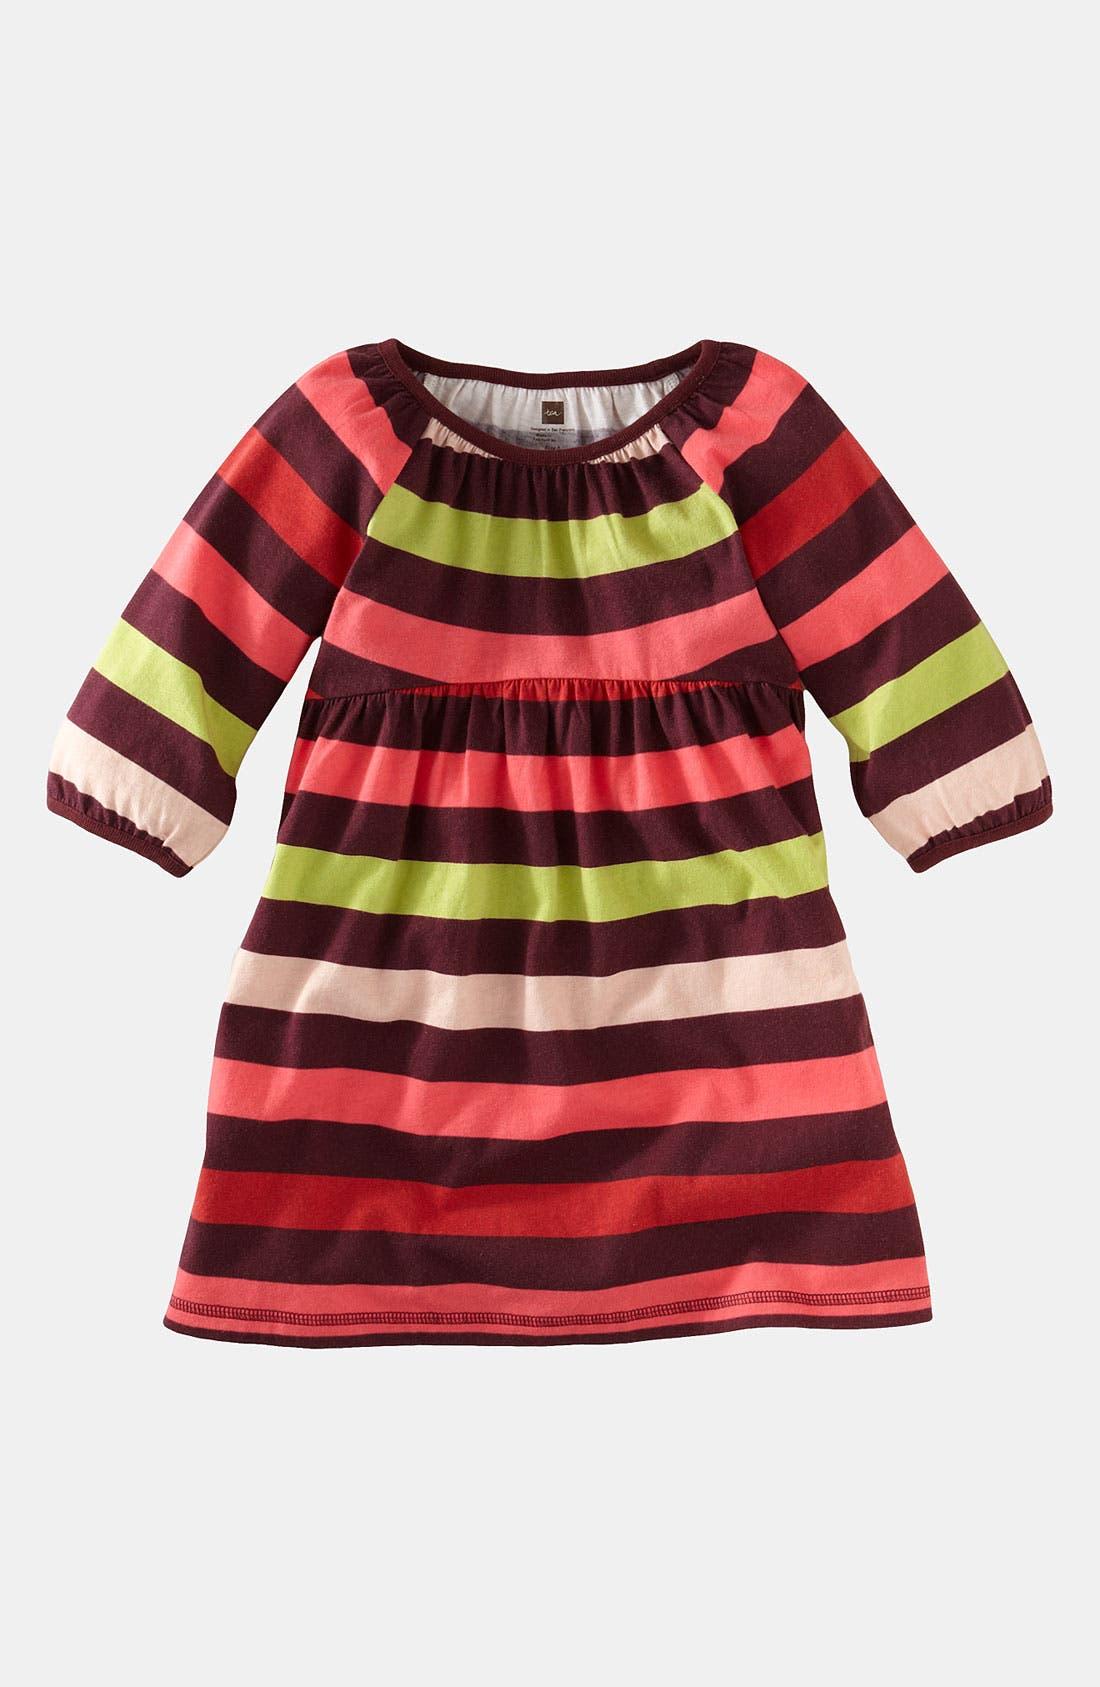 Main Image - Tea Collection 'Skola' Babydoll Dress (Little Girls & Big Girls)